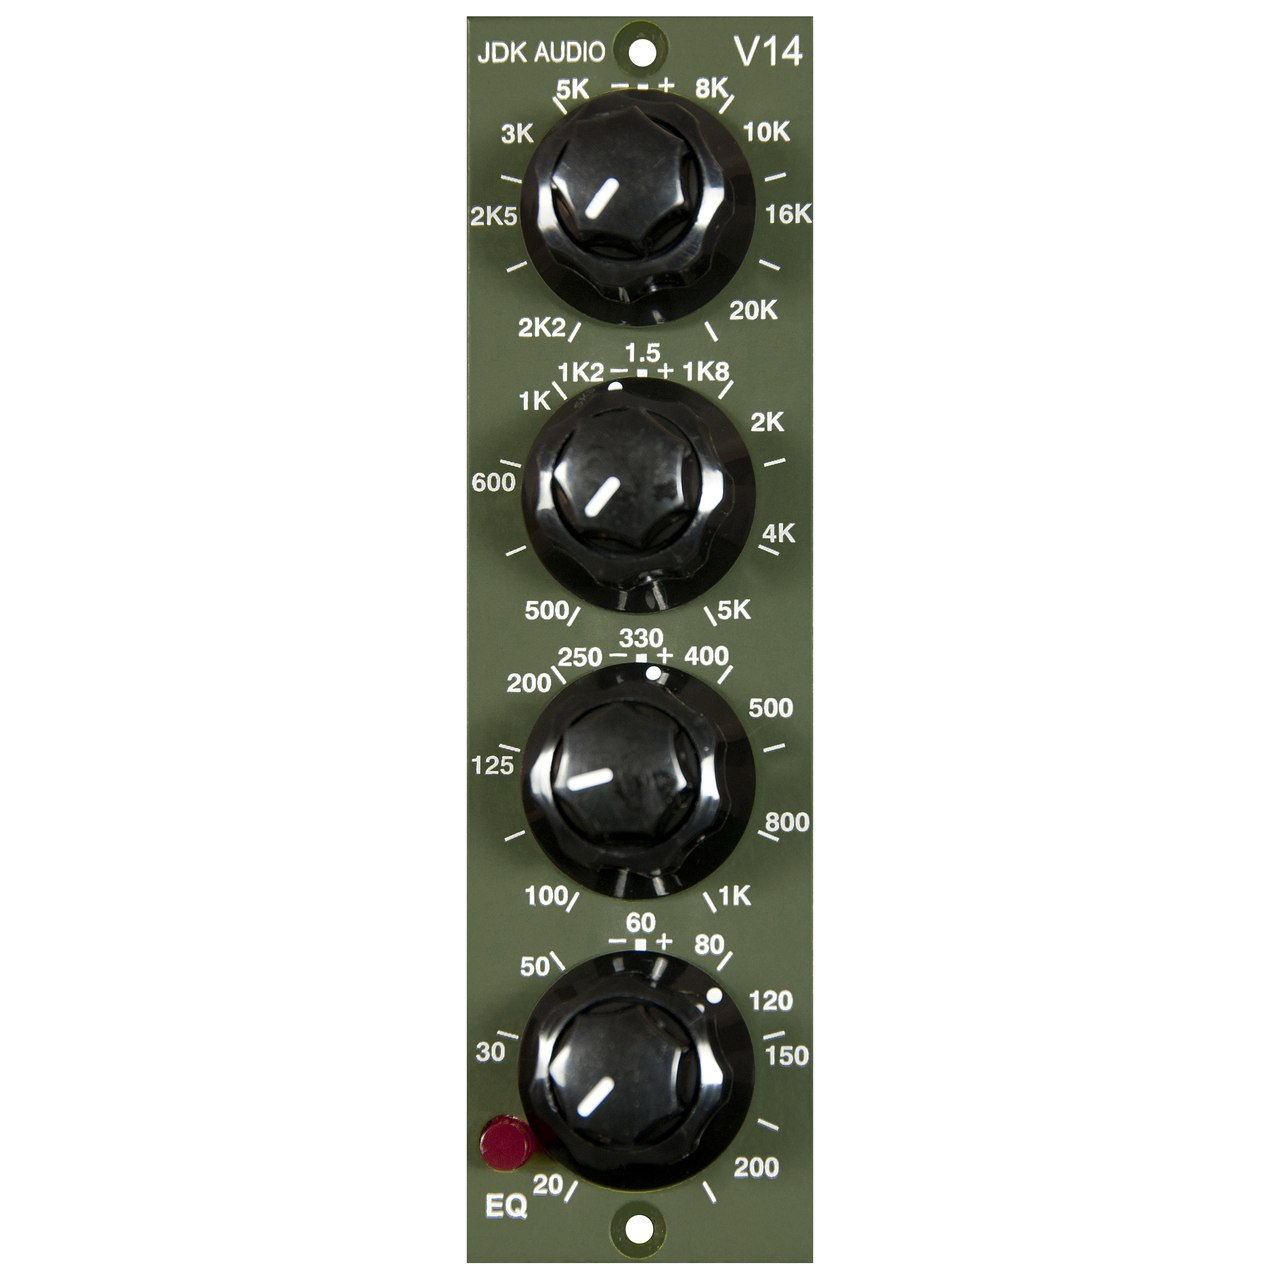 JDK Audio V14 500-Series 4 Band EQ Module